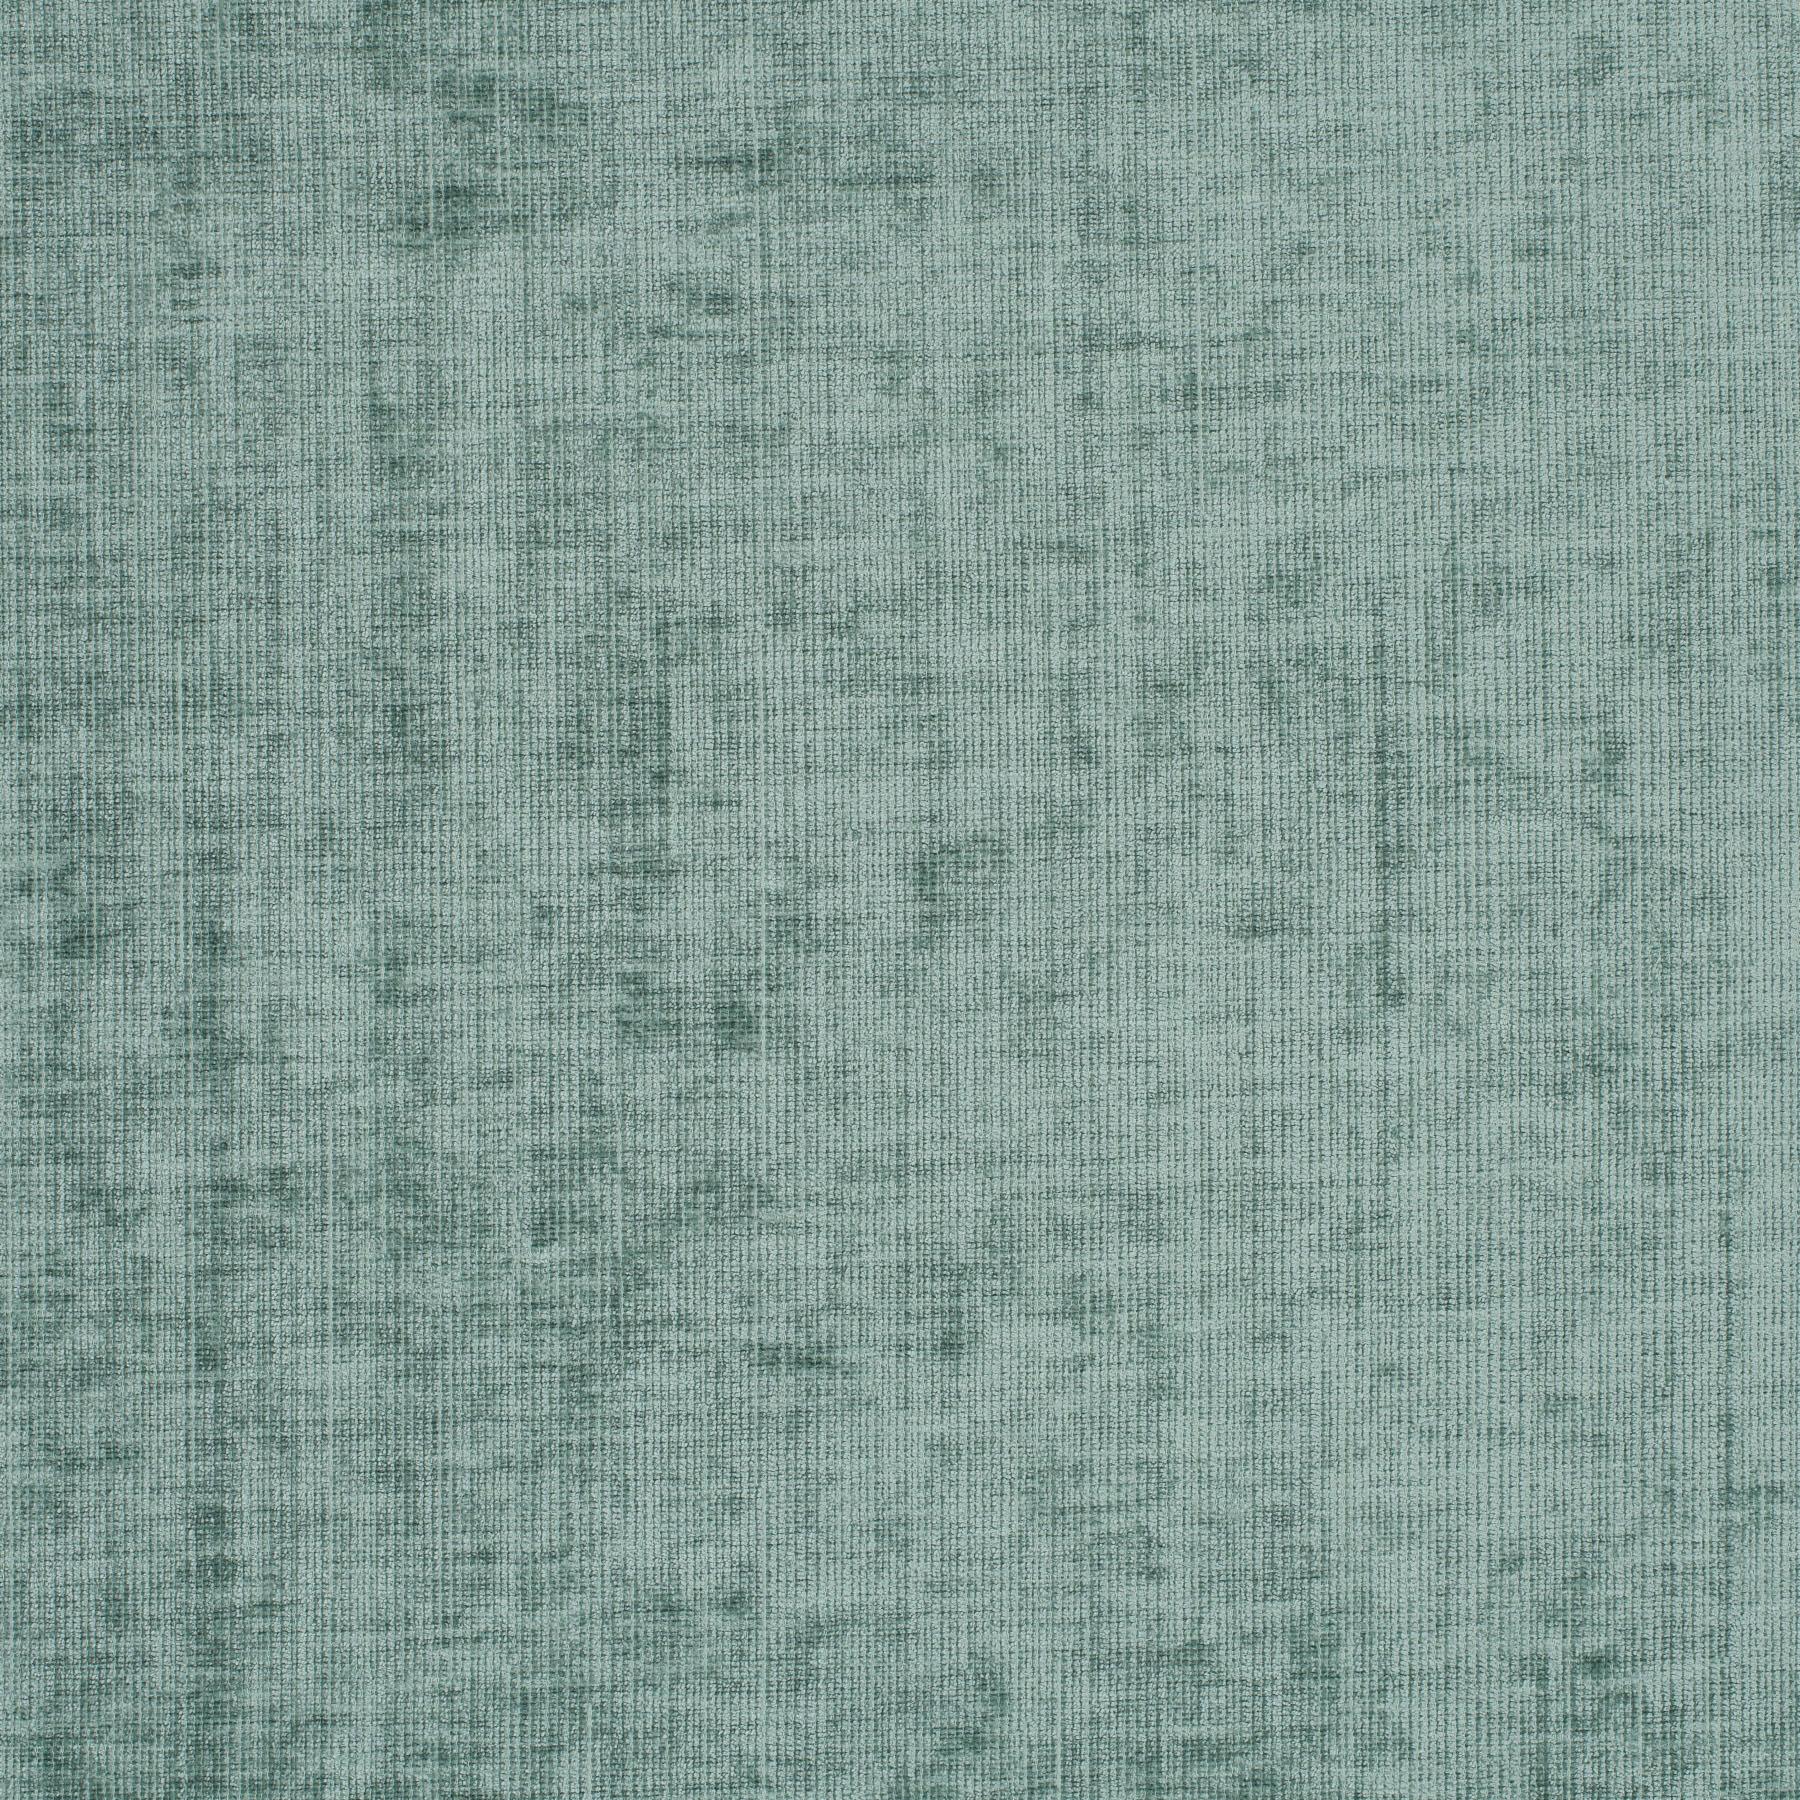 upholstery fabric luciano 1 1255 080 jab anstoetz fabrics. Black Bedroom Furniture Sets. Home Design Ideas